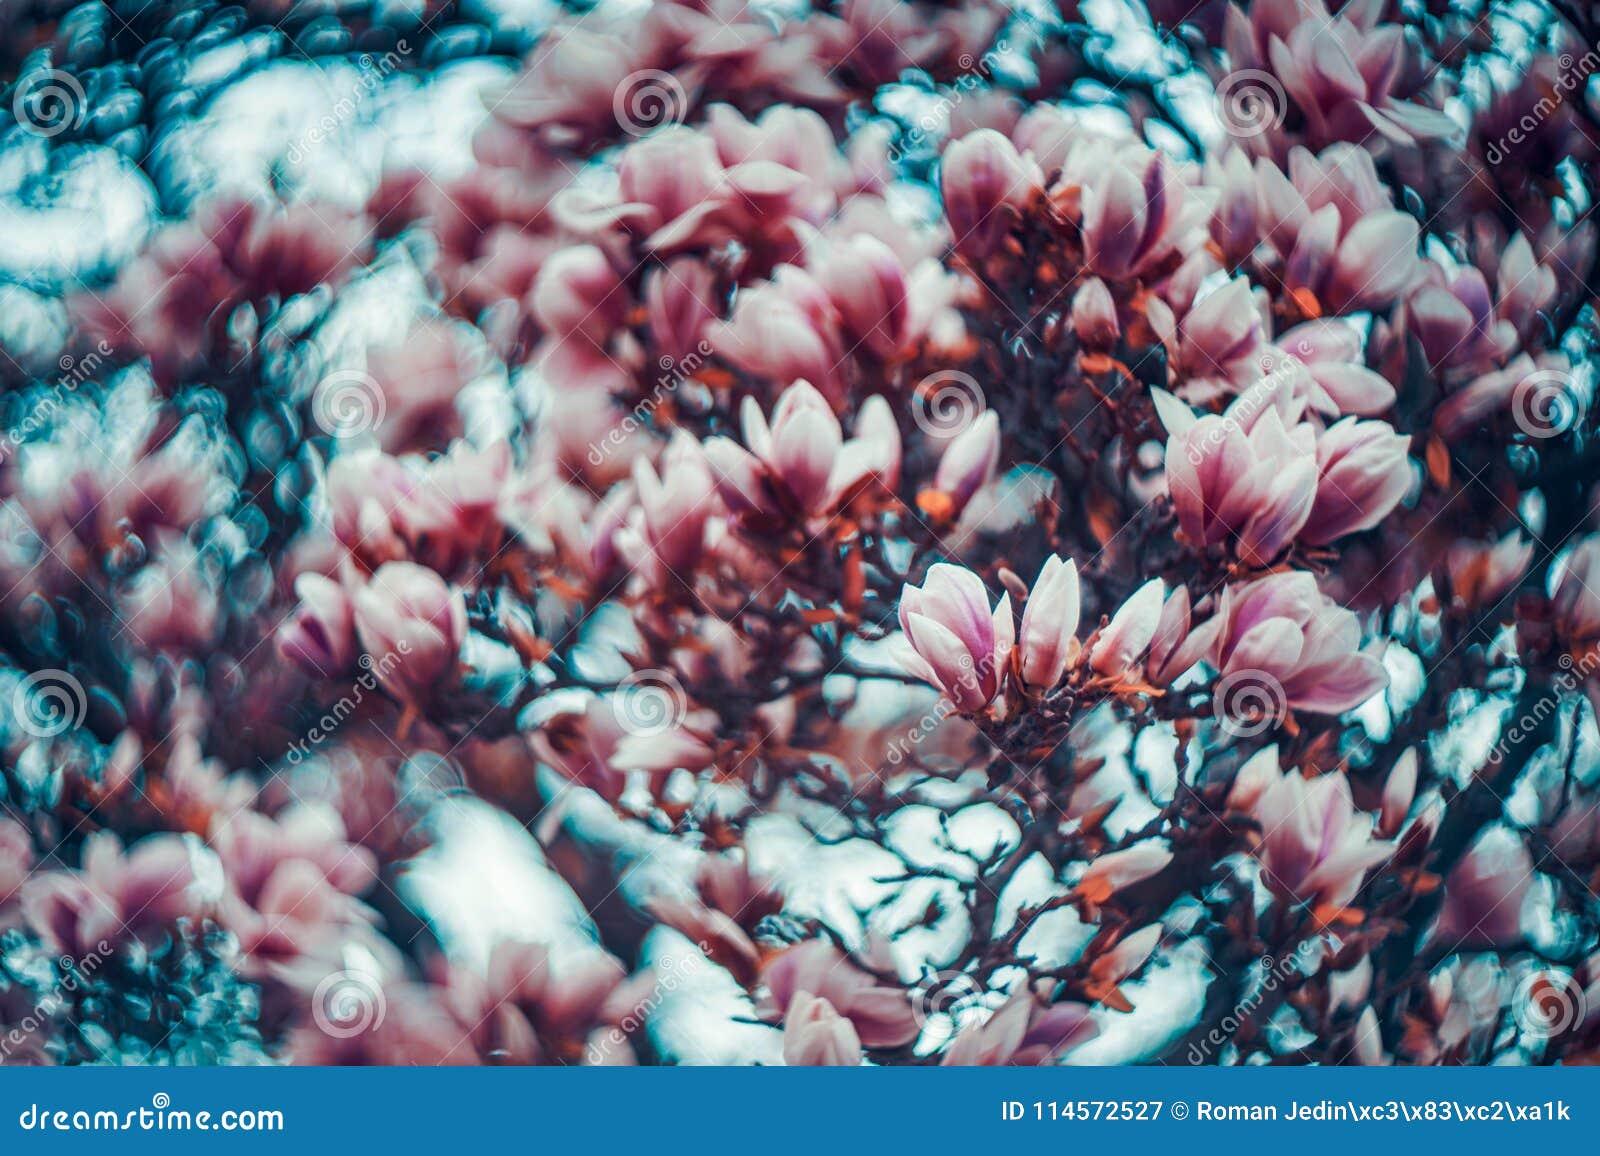 Magnolia dedans swirly